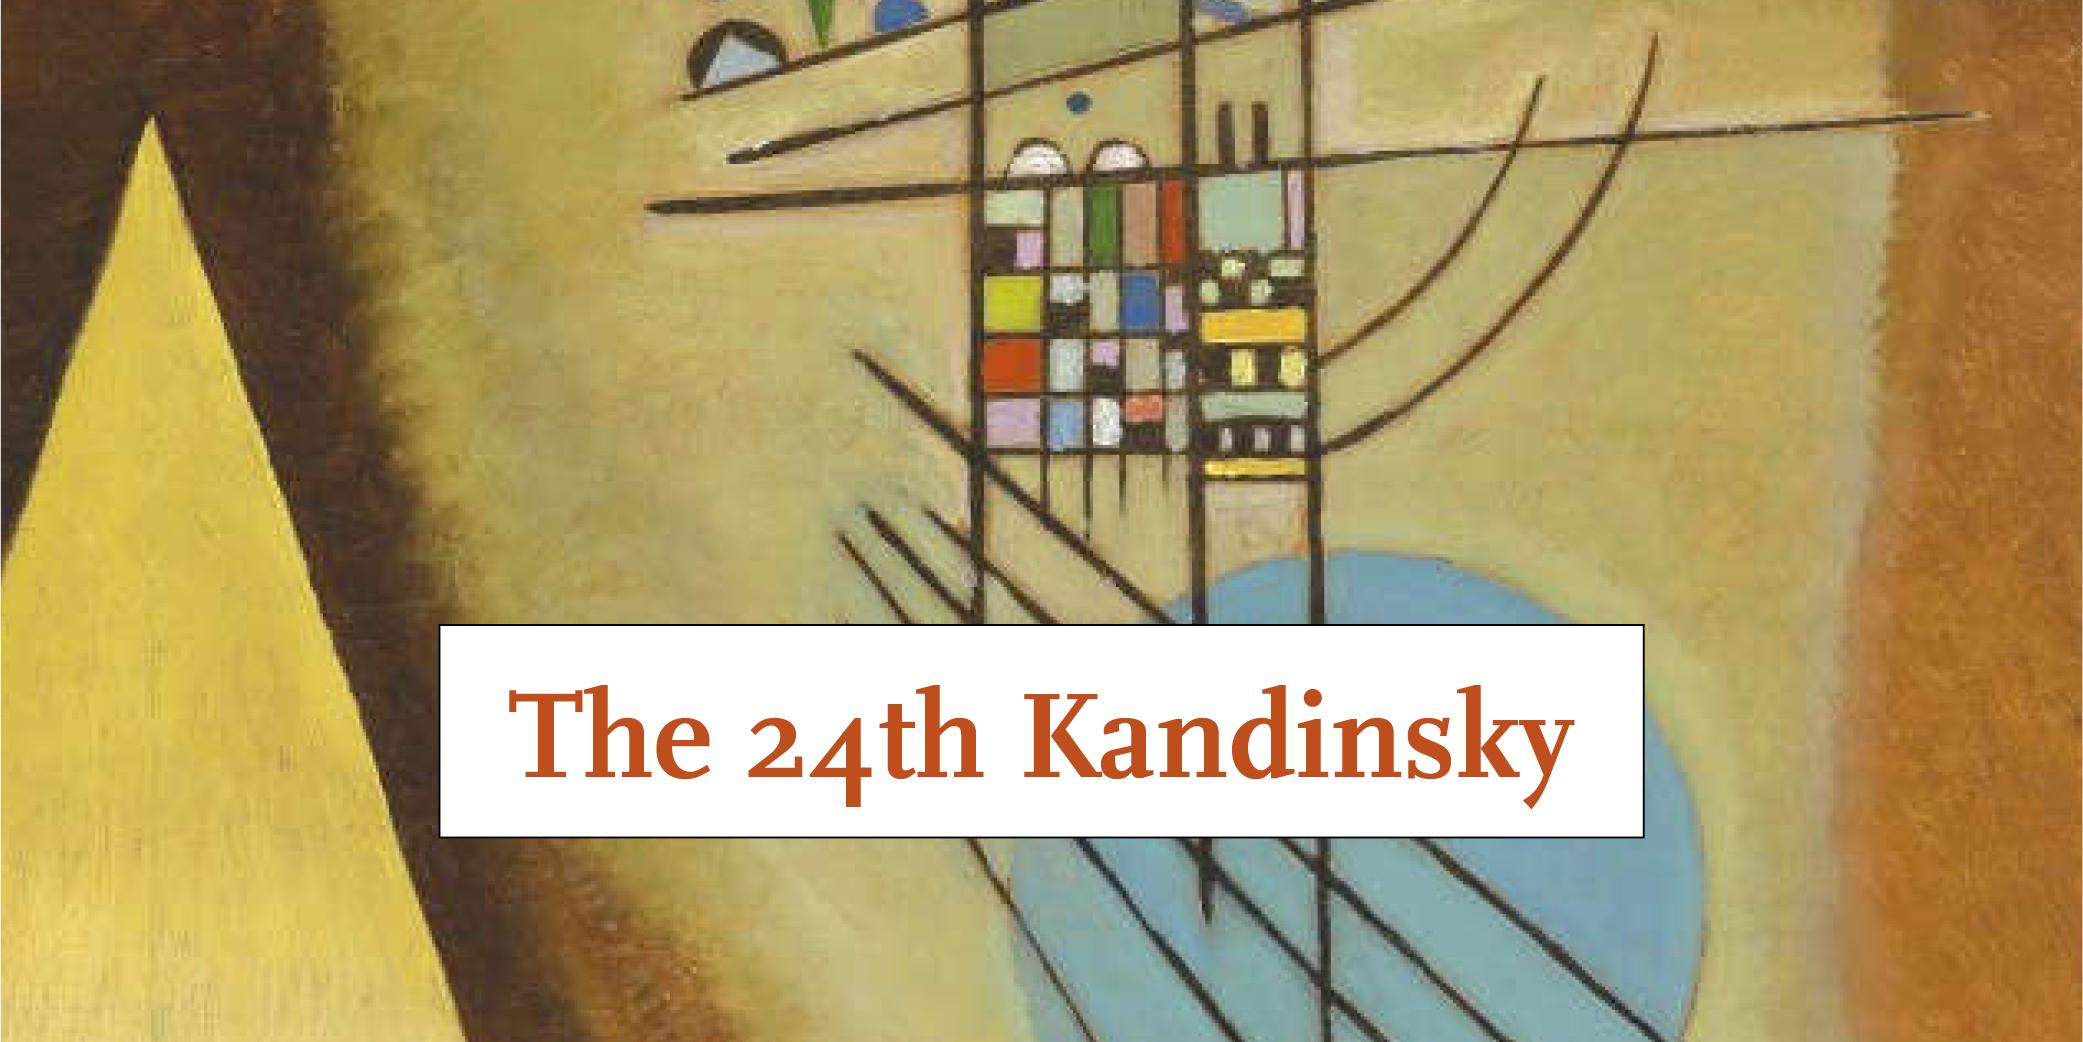 The 24th Kandinsky